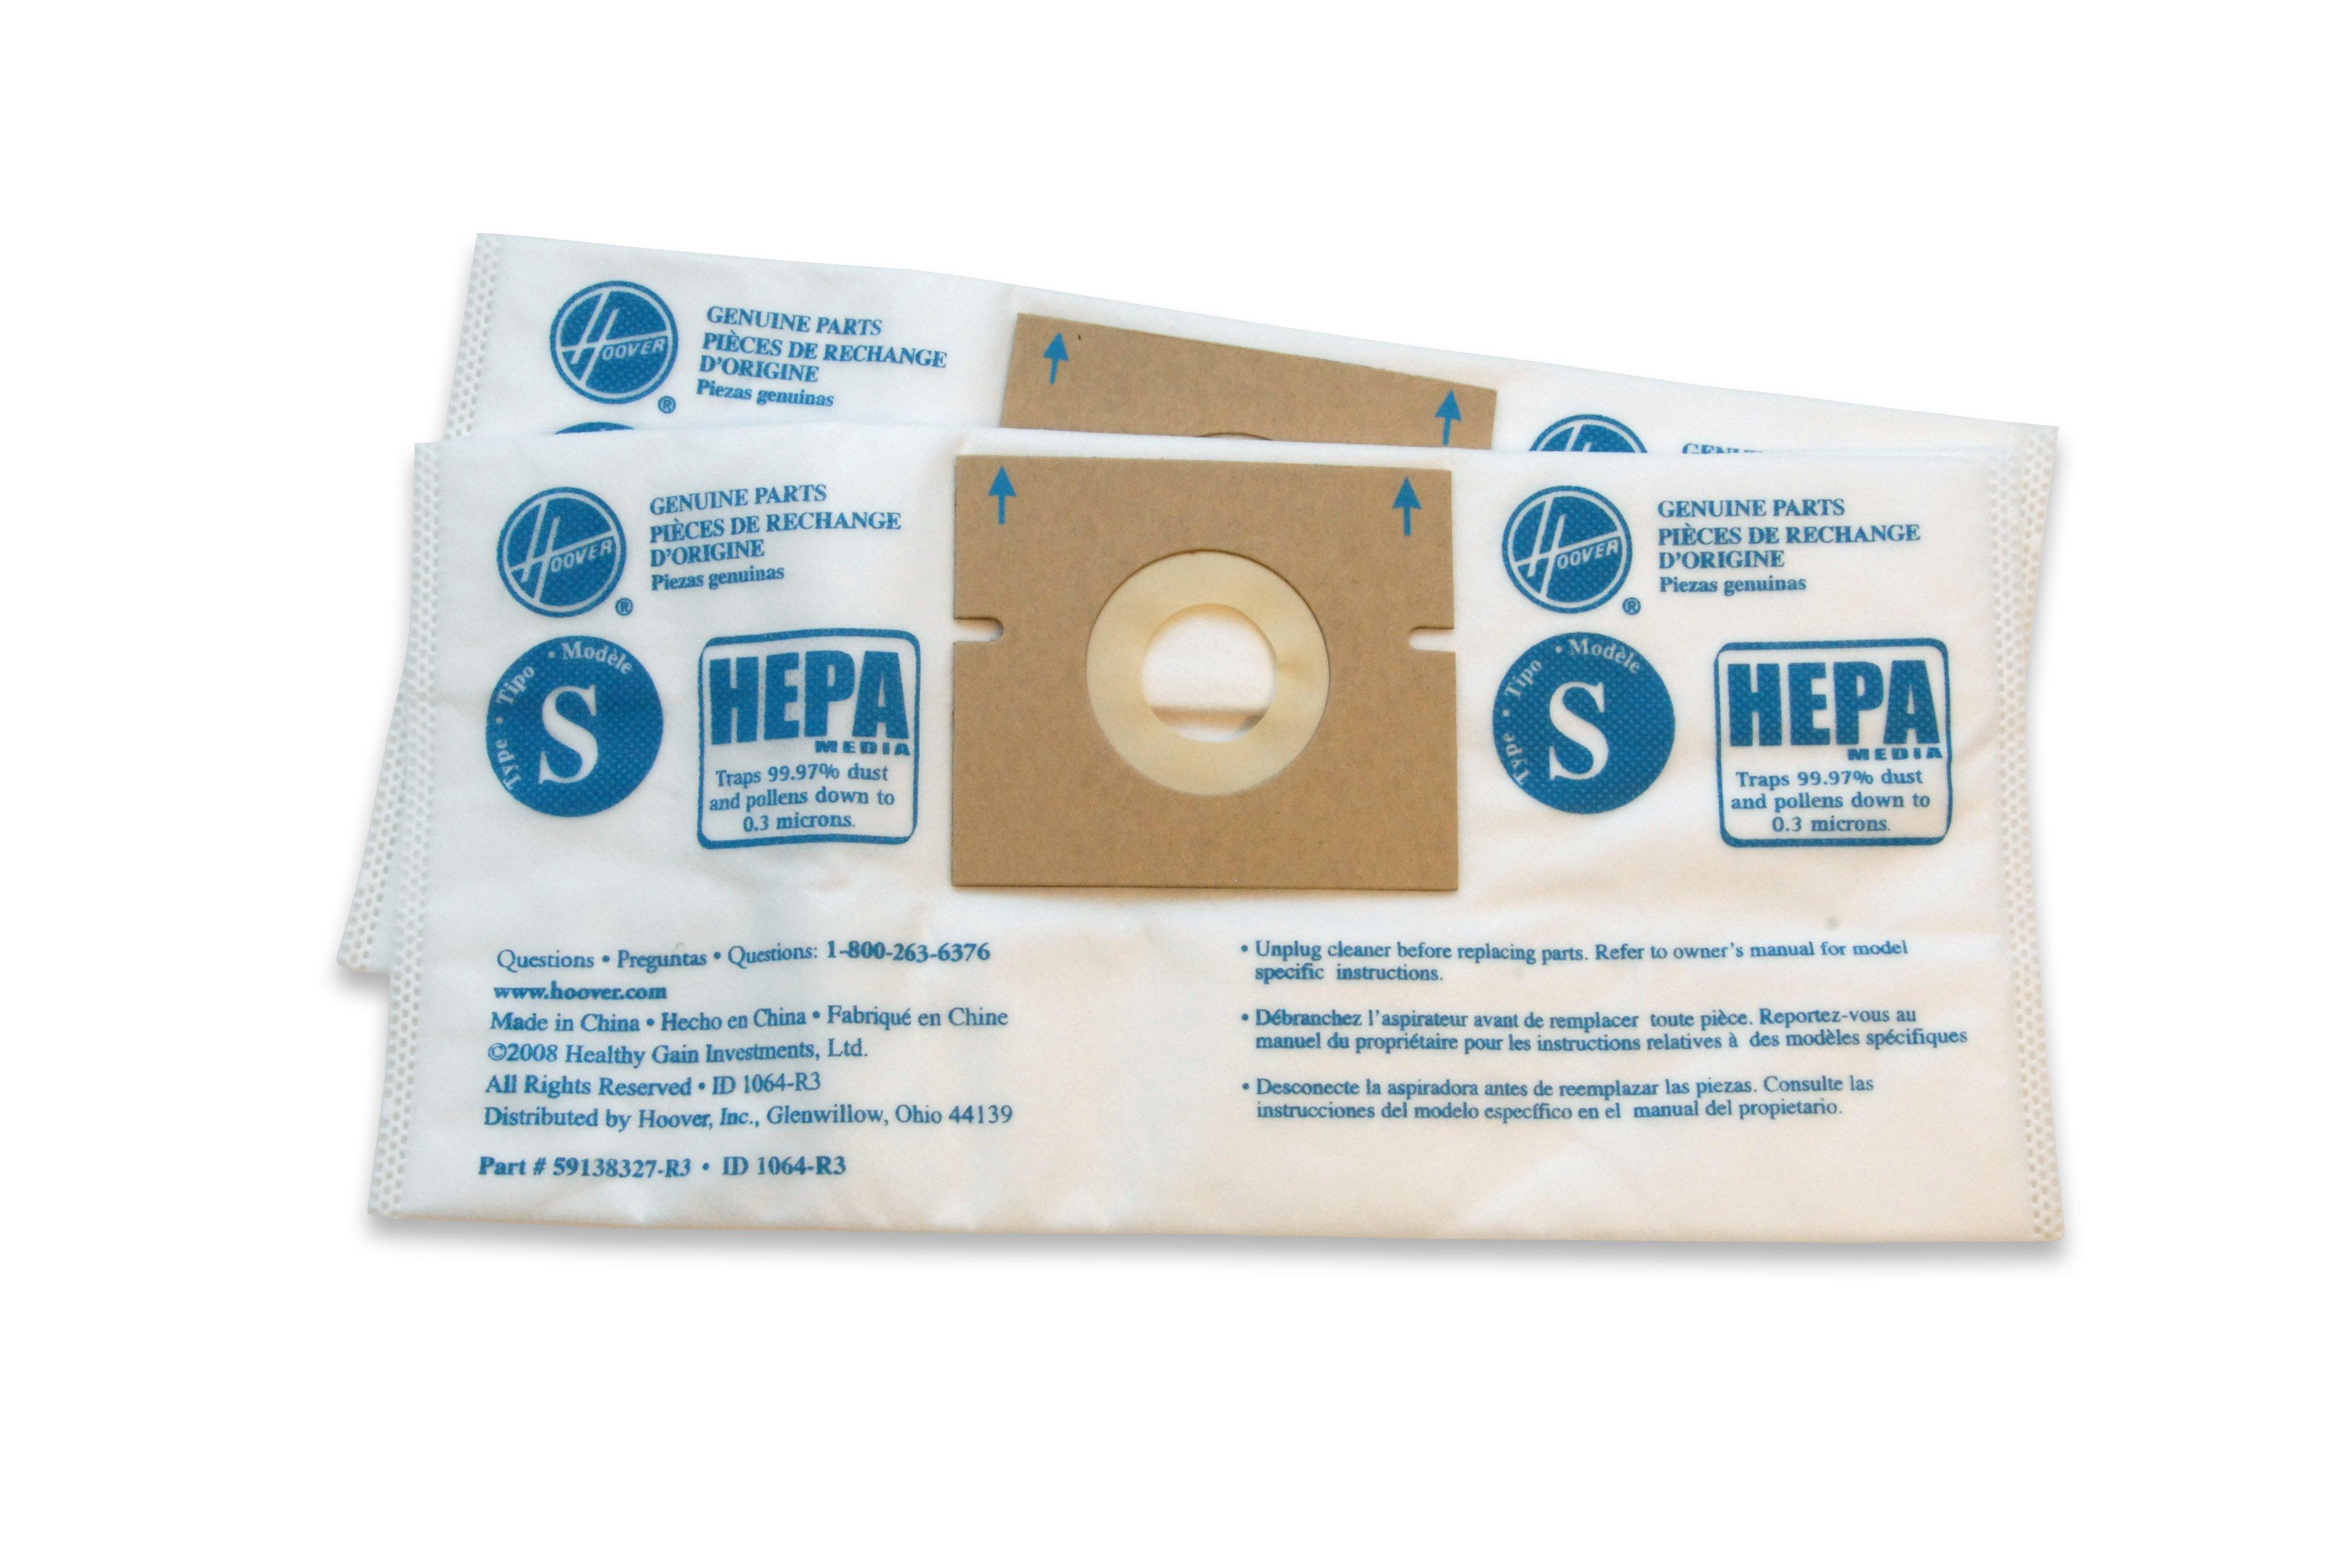 Type S HEPA Bag - 2 Pack4